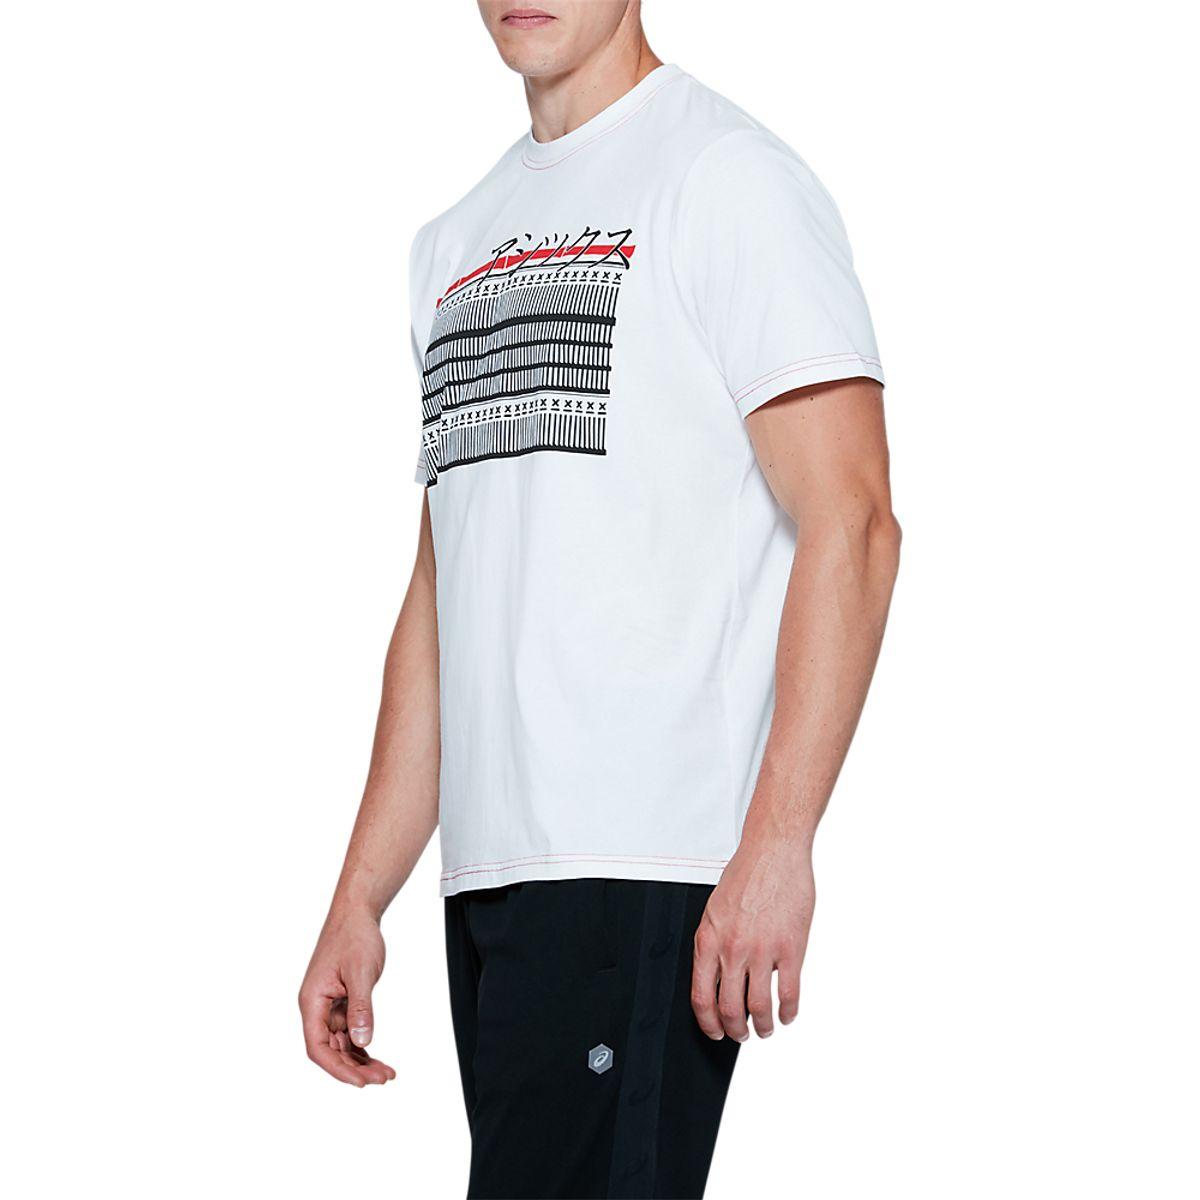 Camiseta-Asics-Kusazuri---Masculino---Branca